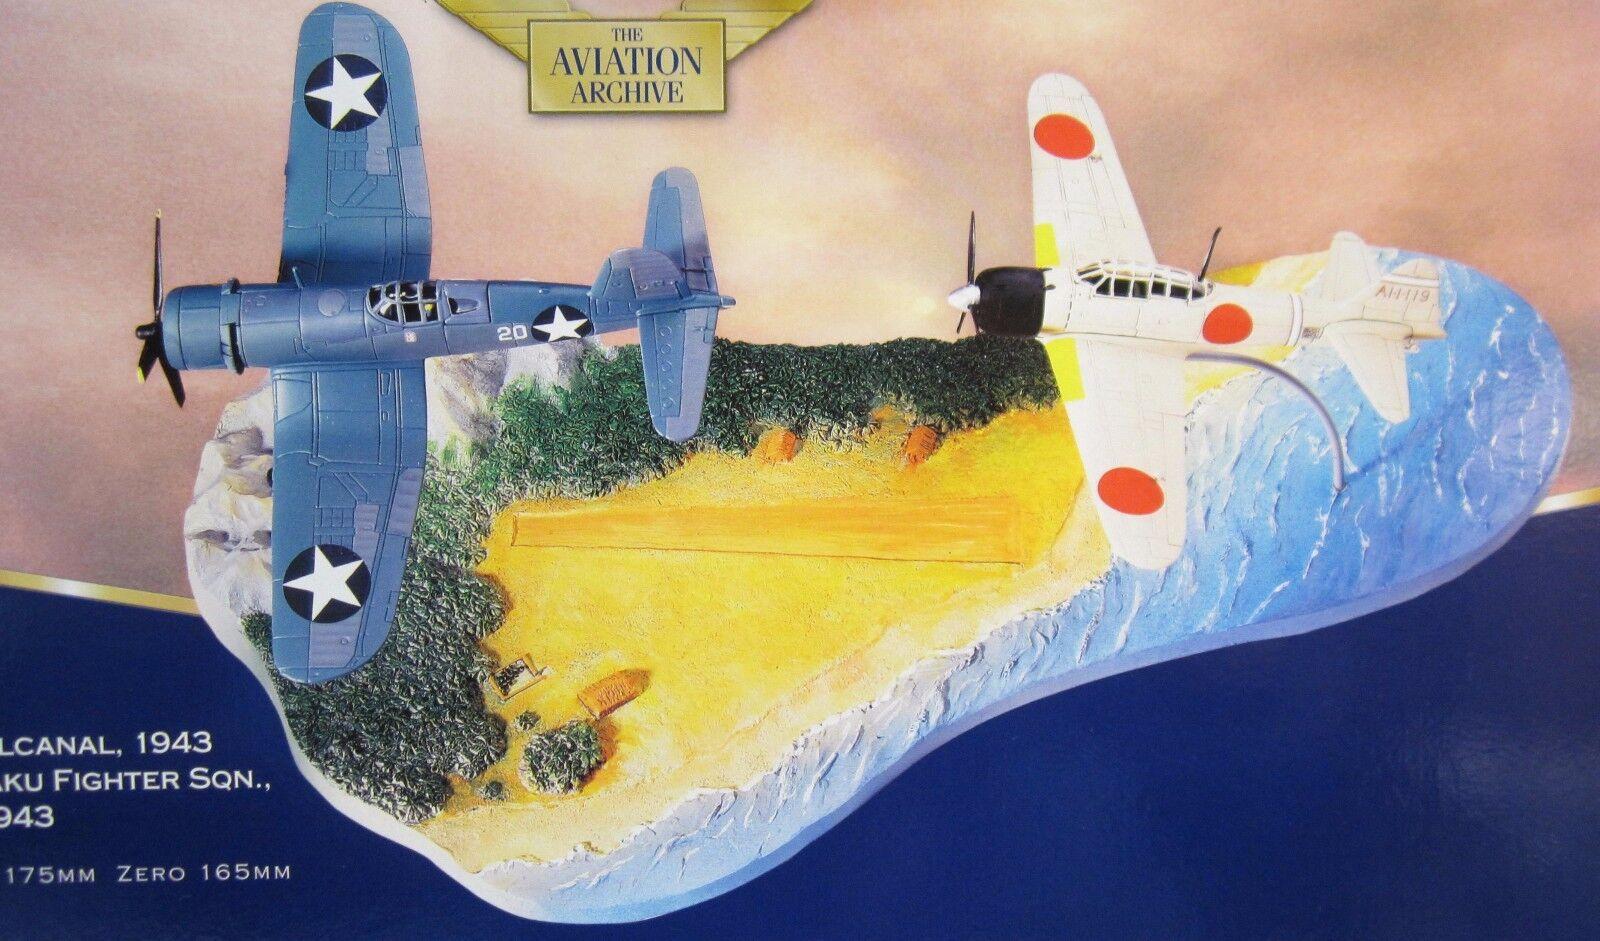 CORGI Guadalcanal 2 Avion Set Corsair F4U -1 & MITSUBISHI A6M2 ZERO + DIORAMA 1 72